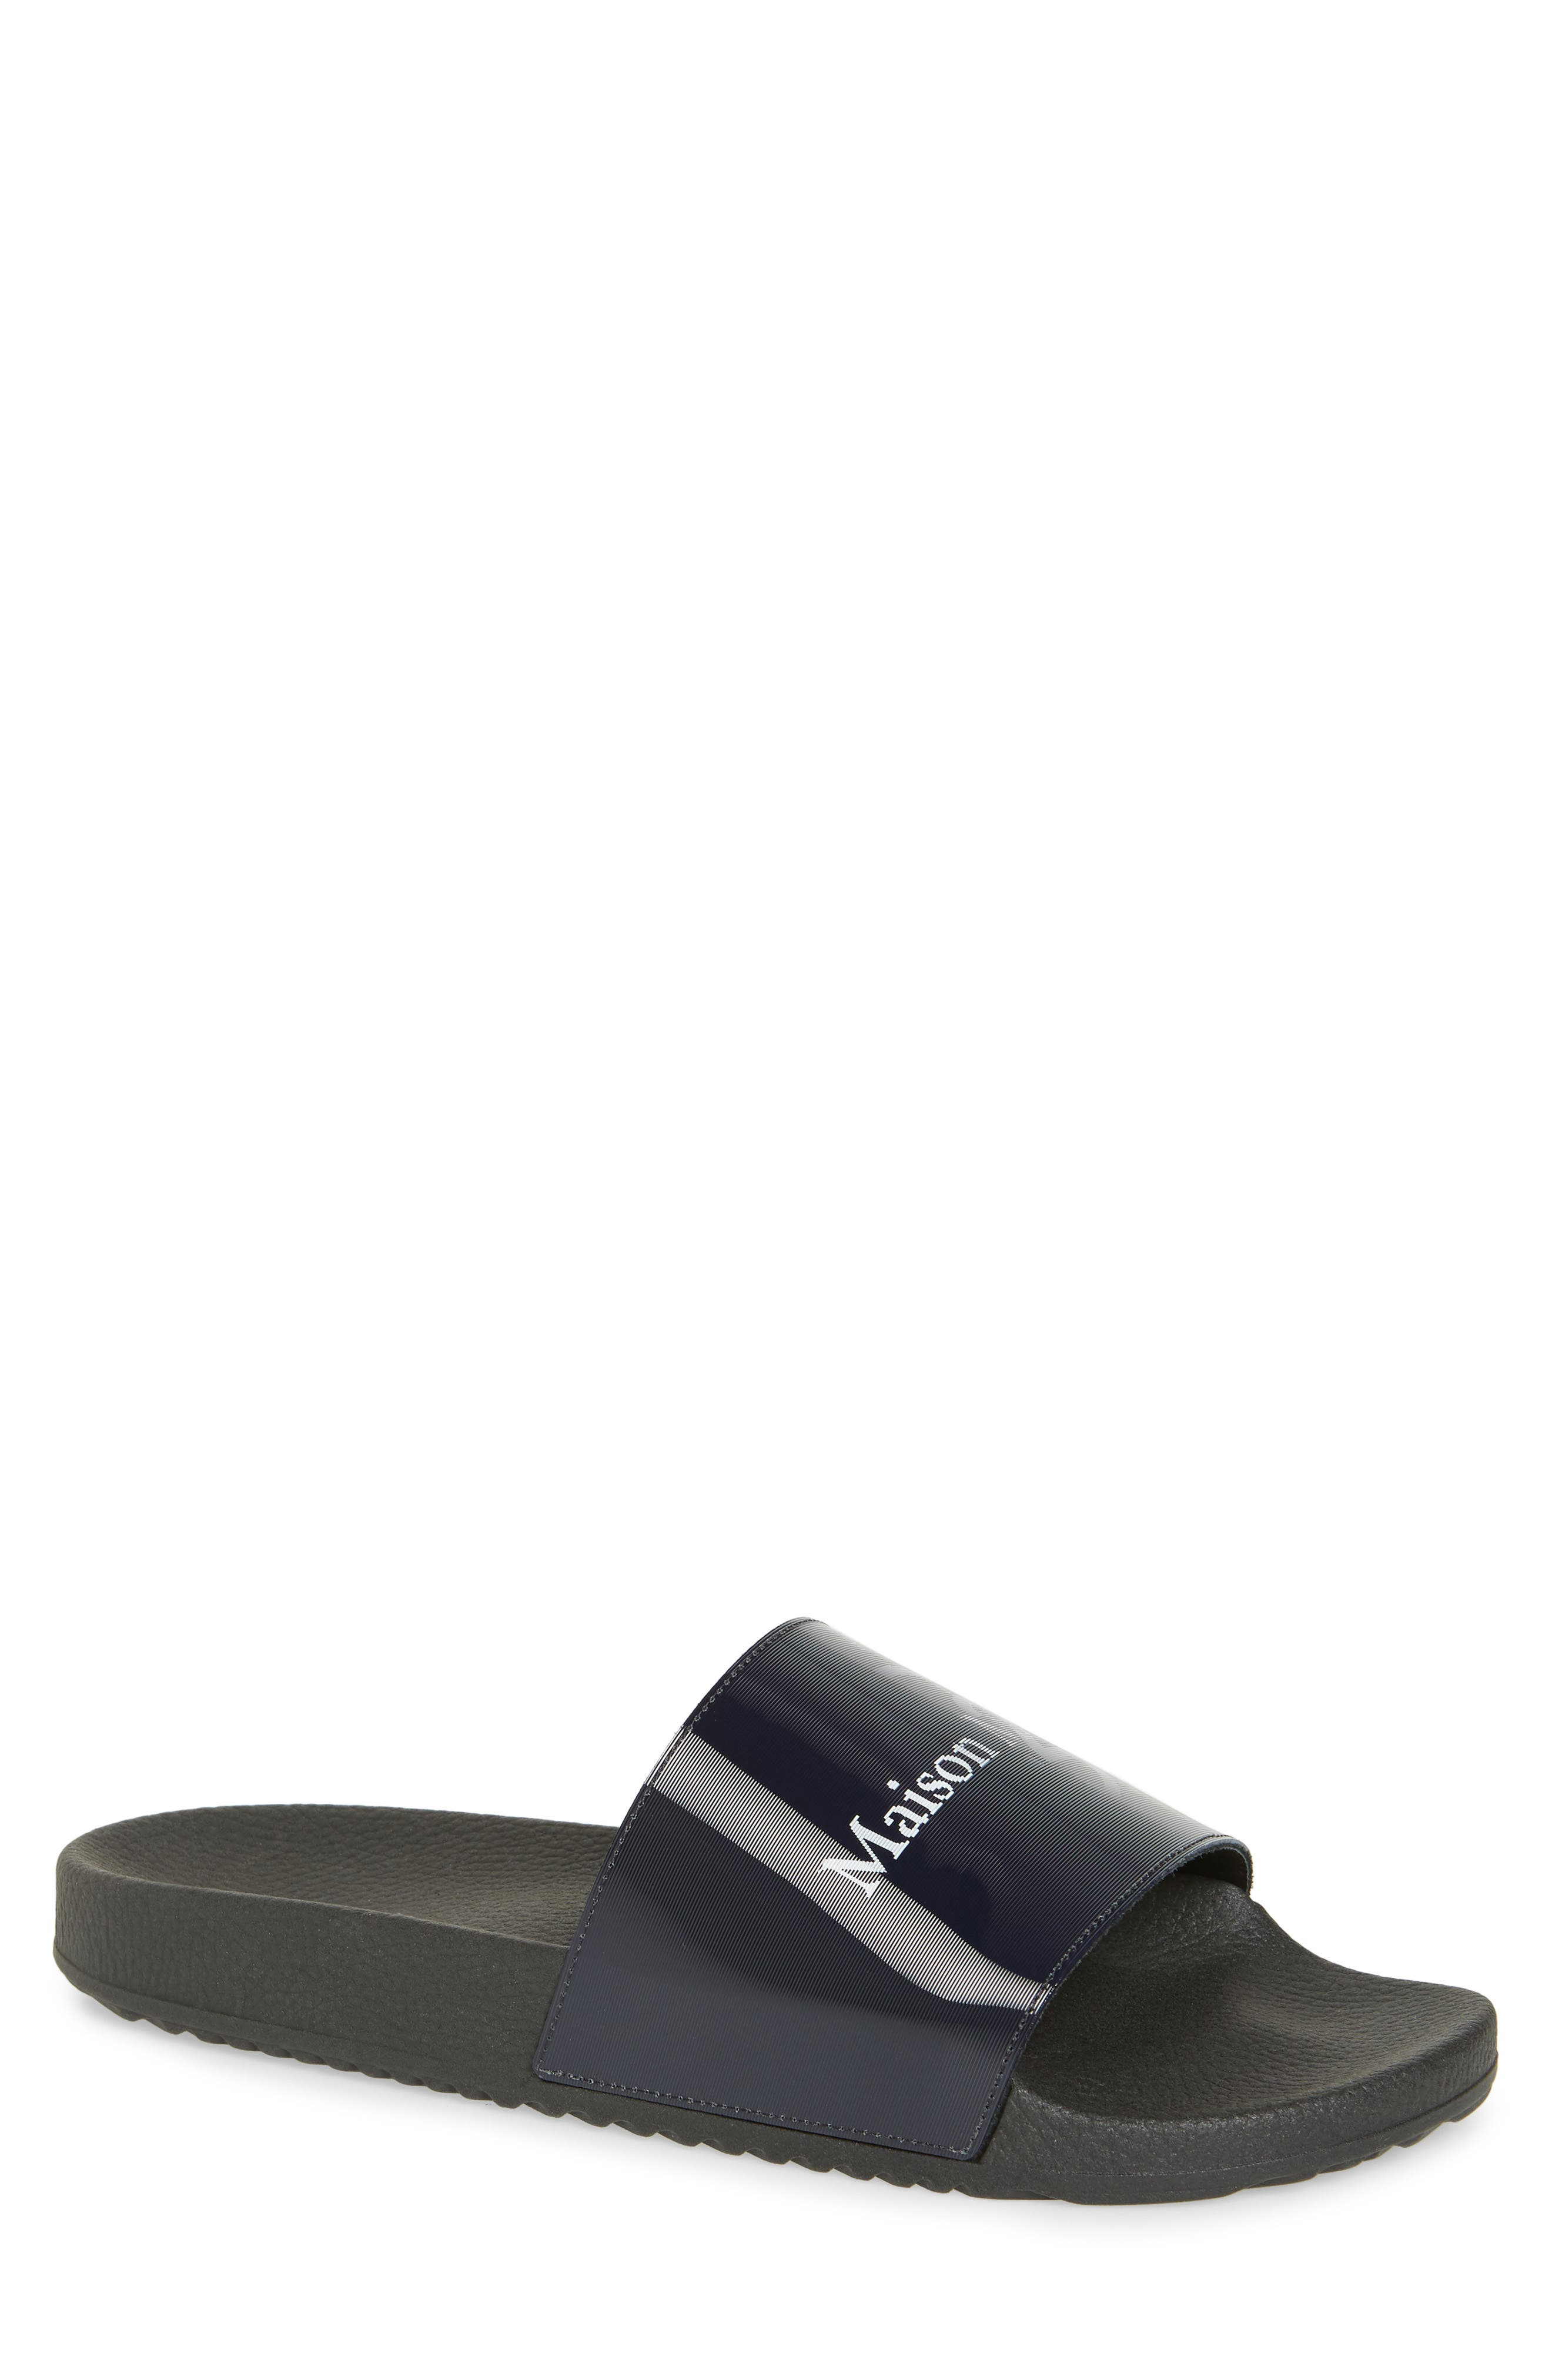 ,                             Pool Slide Sandal,                             Main thumbnail 1, color,                             BLACK/ OFF WHITE